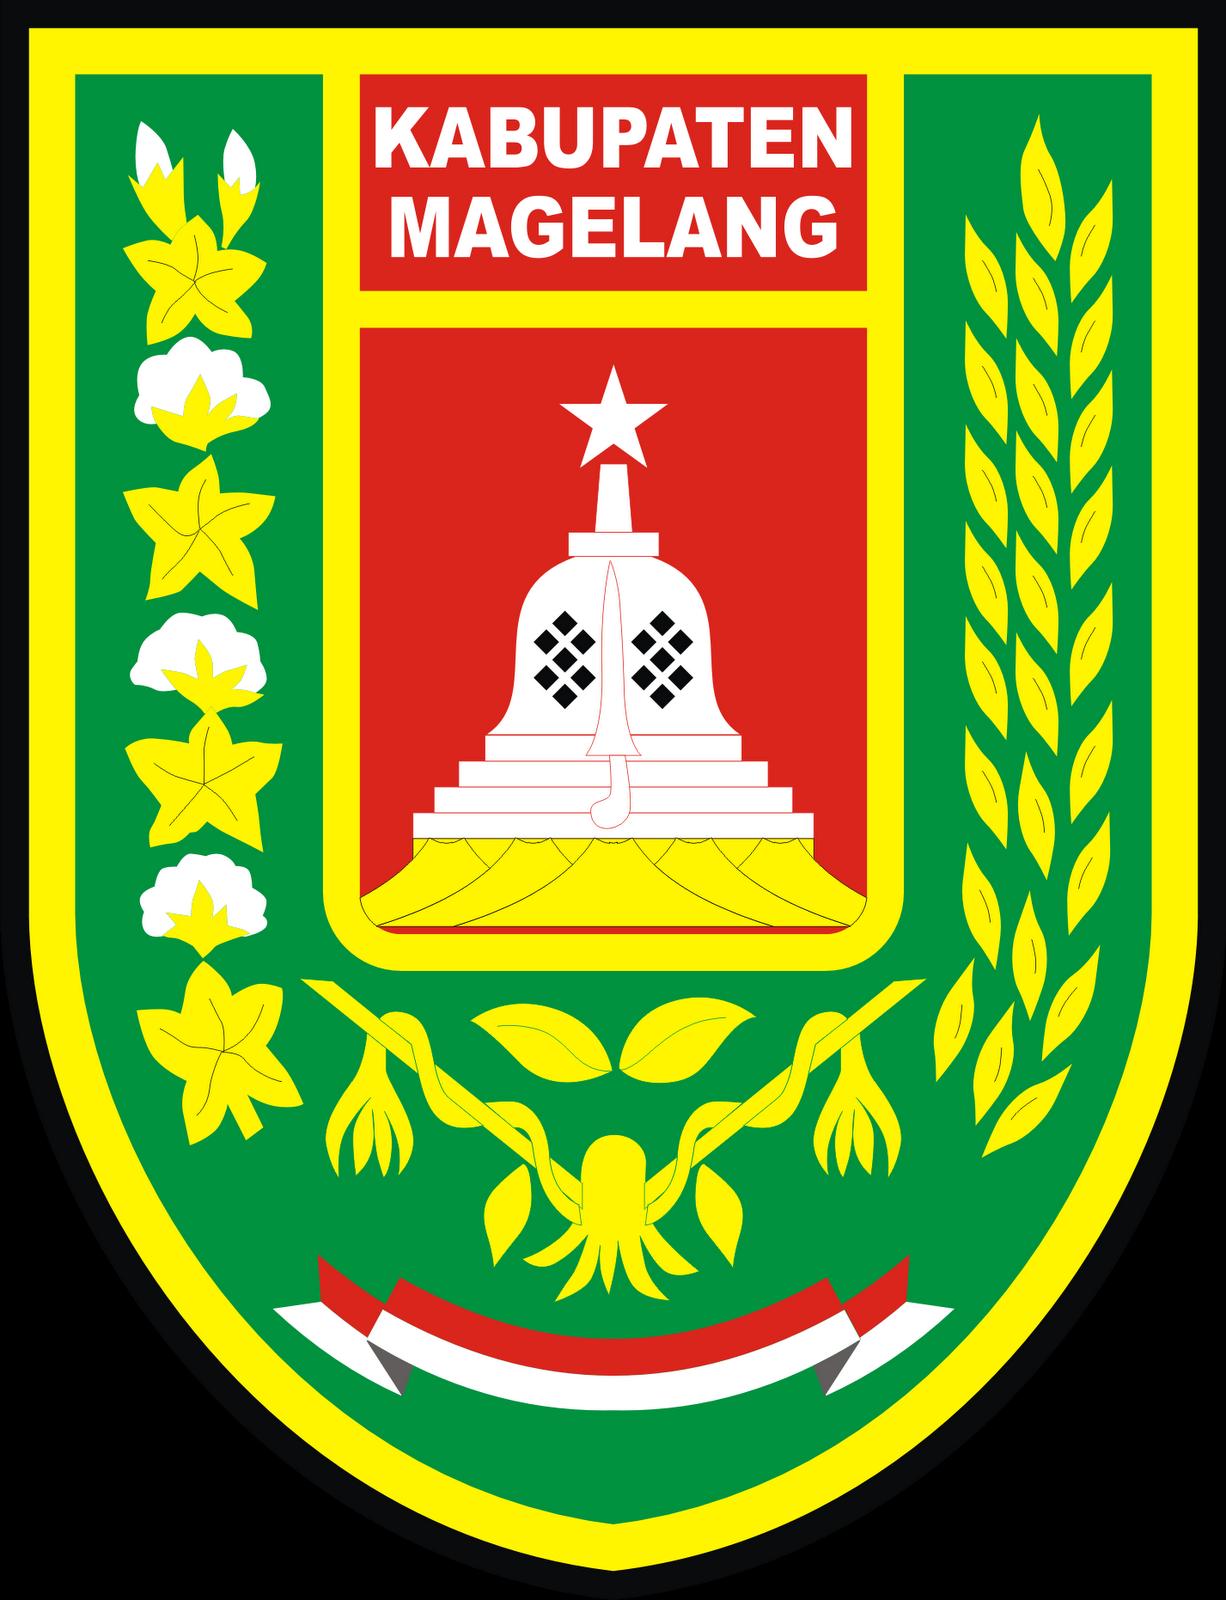 14 Kabupaten Magelang Kota Gambar Magelang